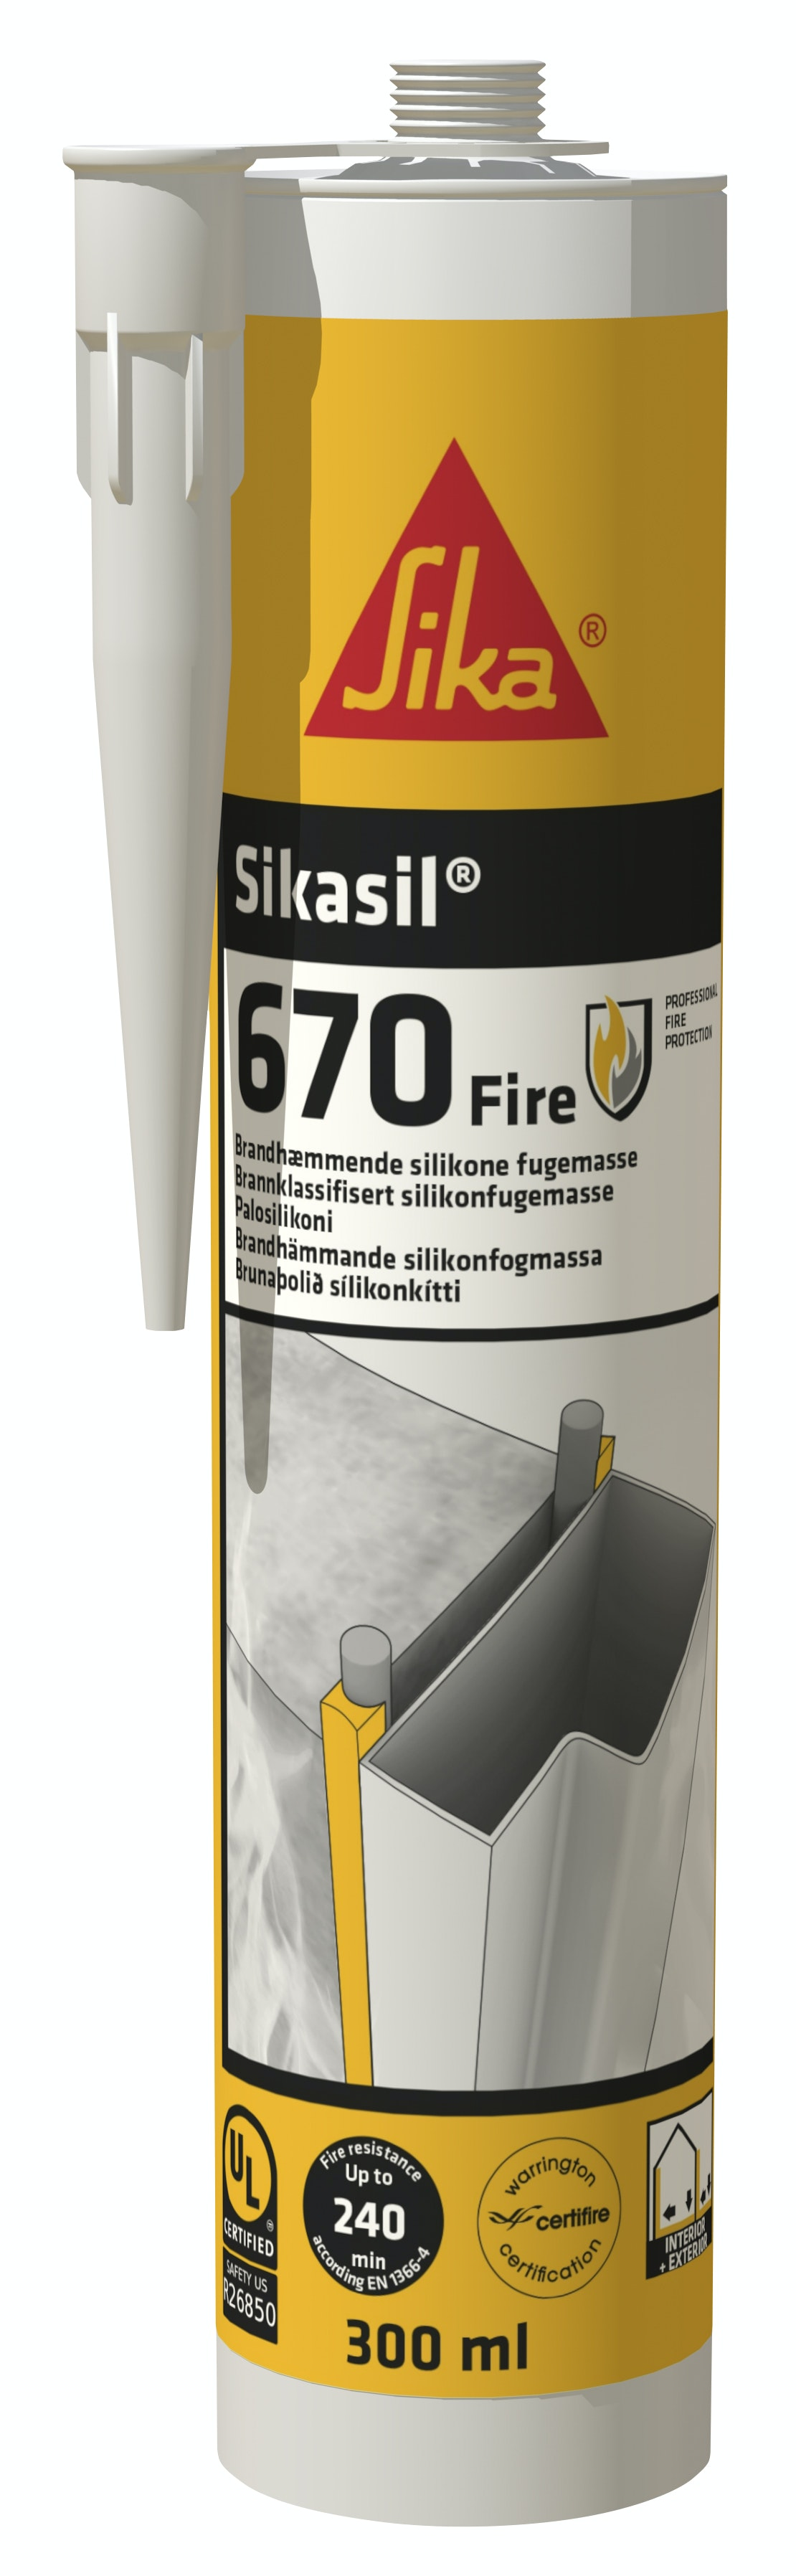 Brandfog Sika SikaSil®-670 Fire Vit 300ml